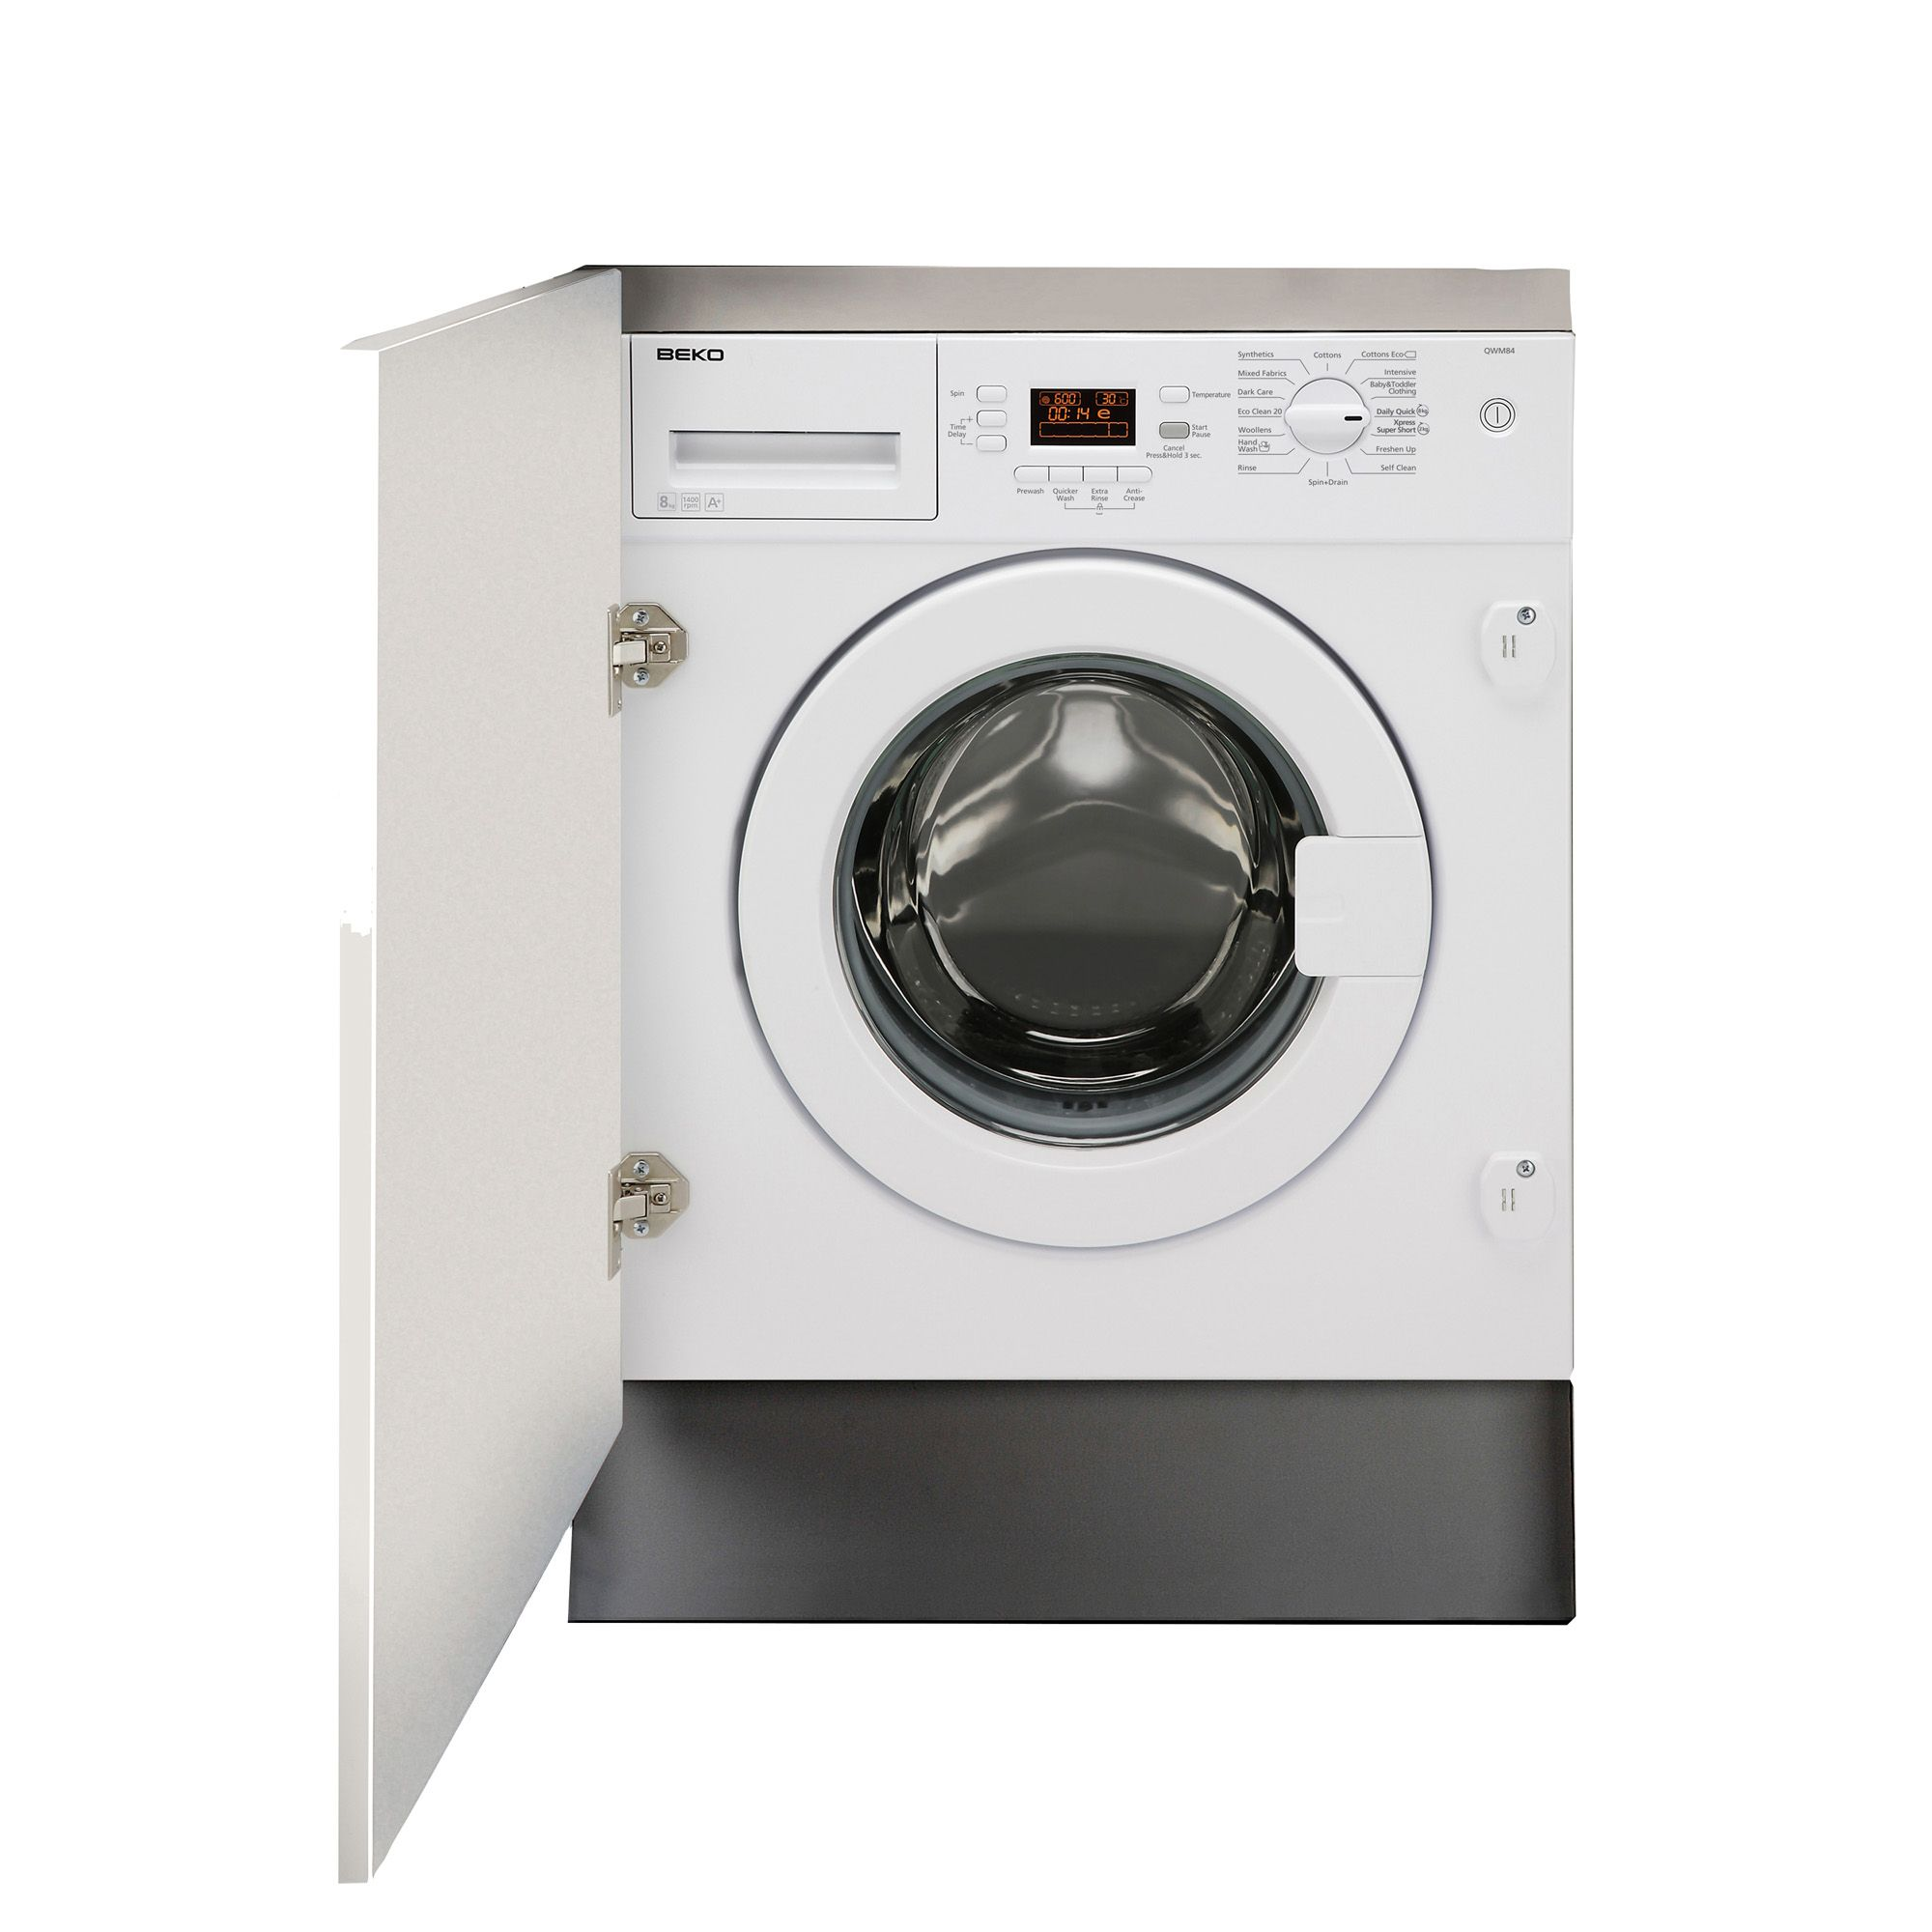 beko wiy84540f white built in washing machine. Black Bedroom Furniture Sets. Home Design Ideas